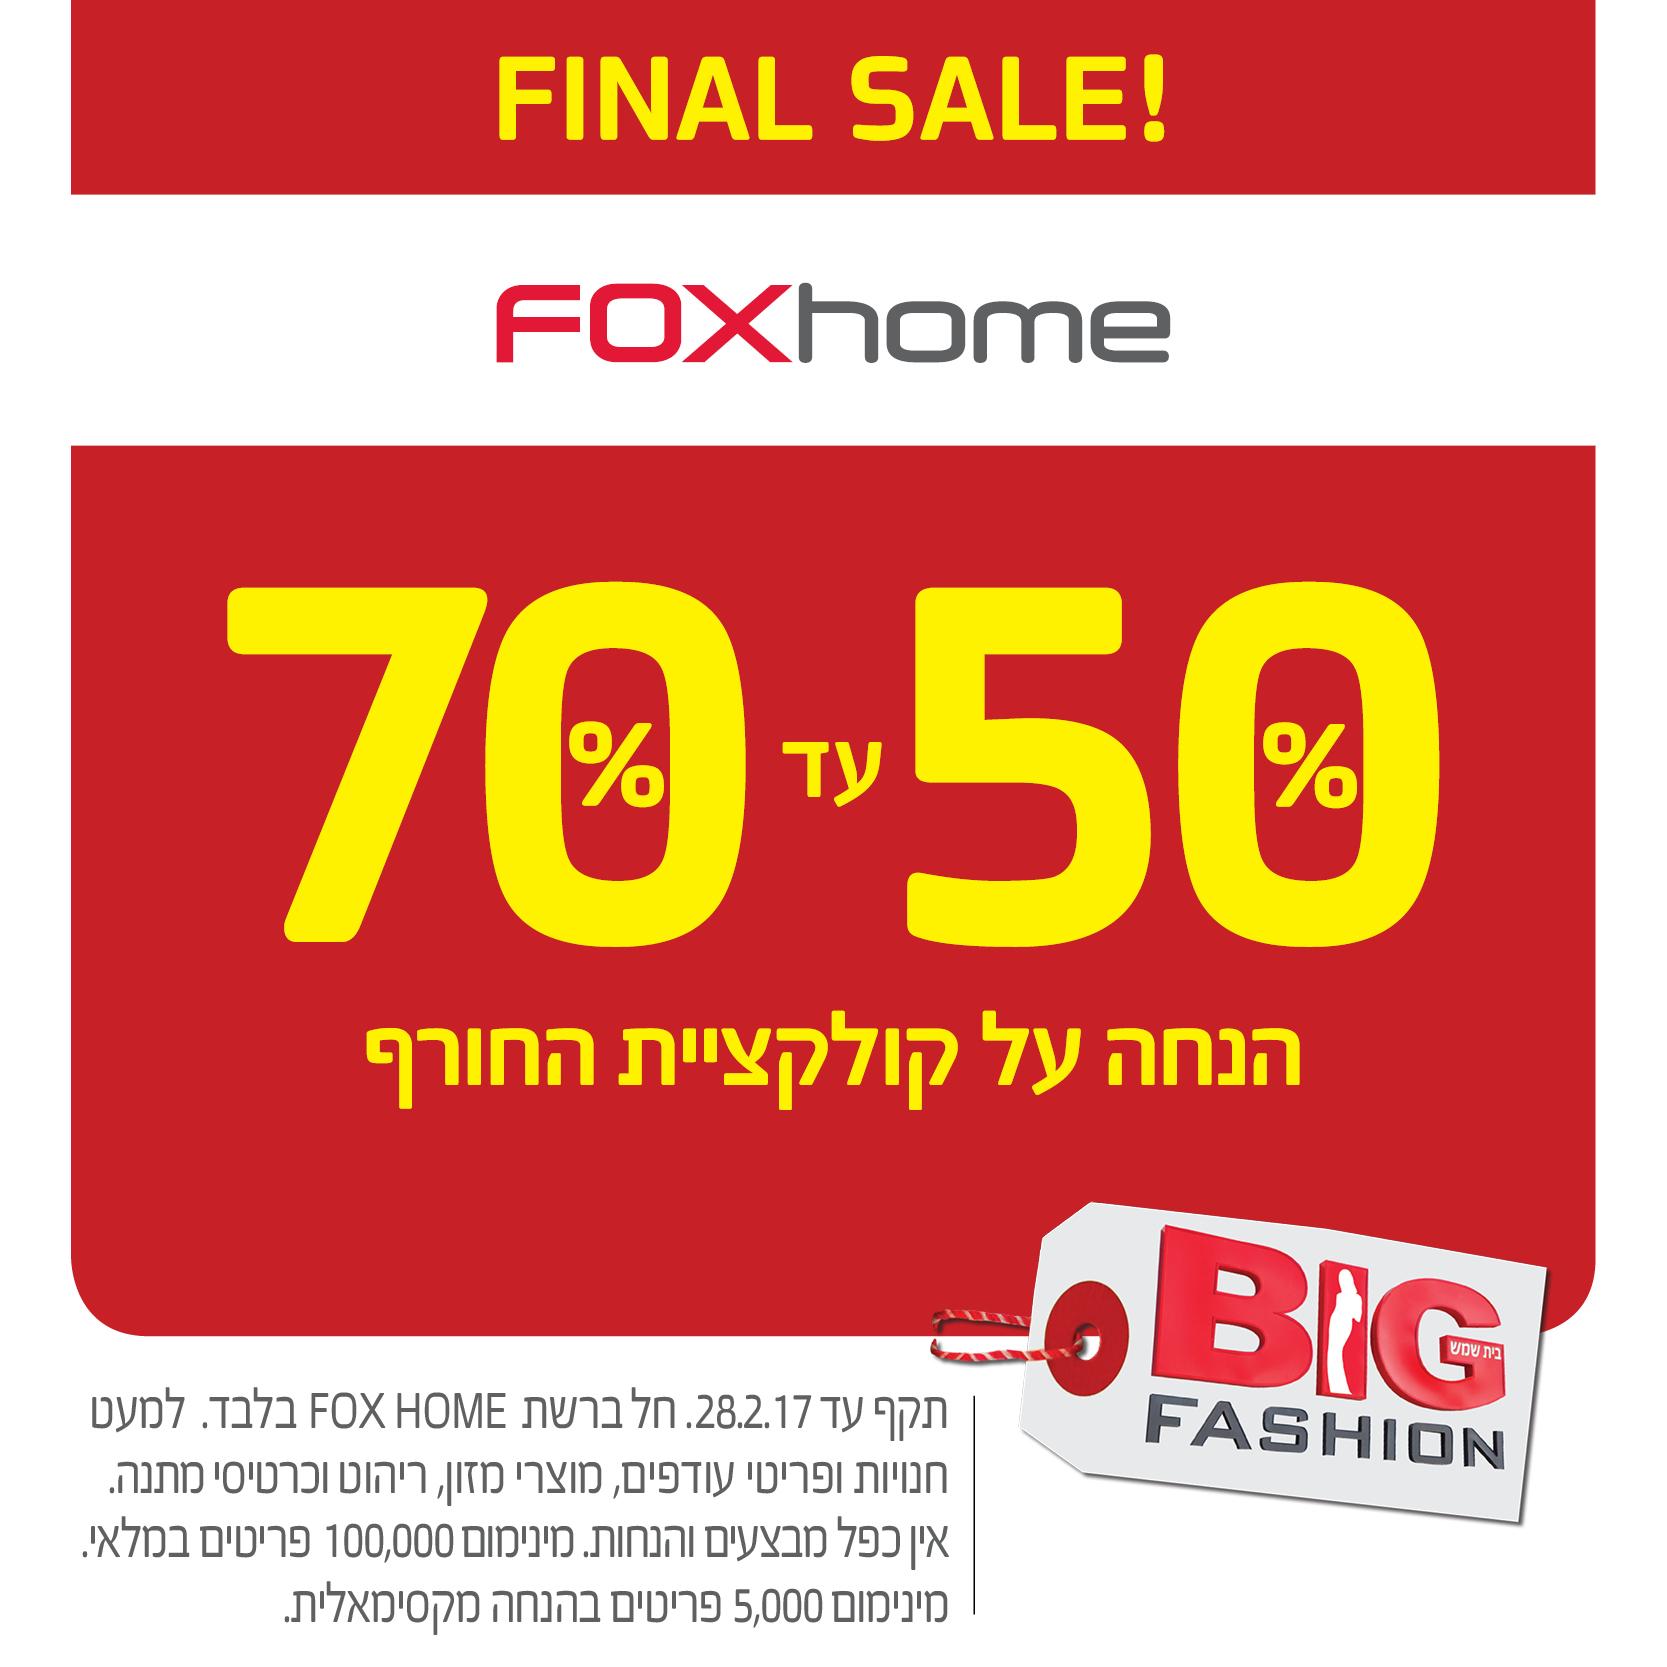 fox home ב- final sale!